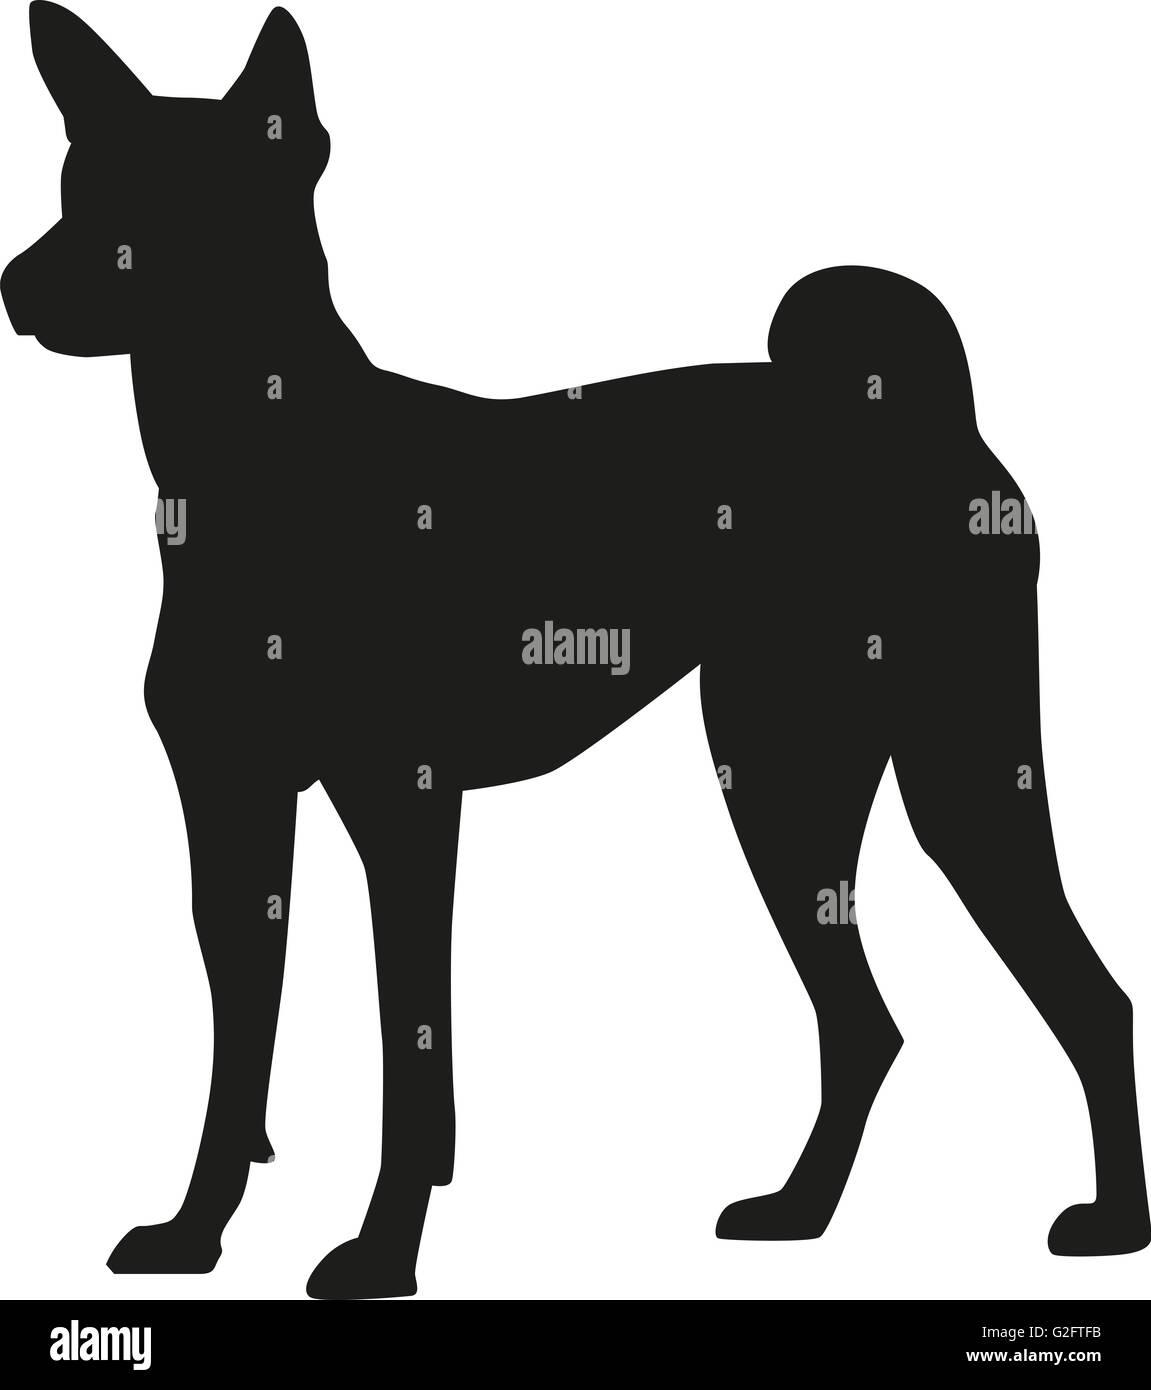 Basenji silhouette - Stock Image